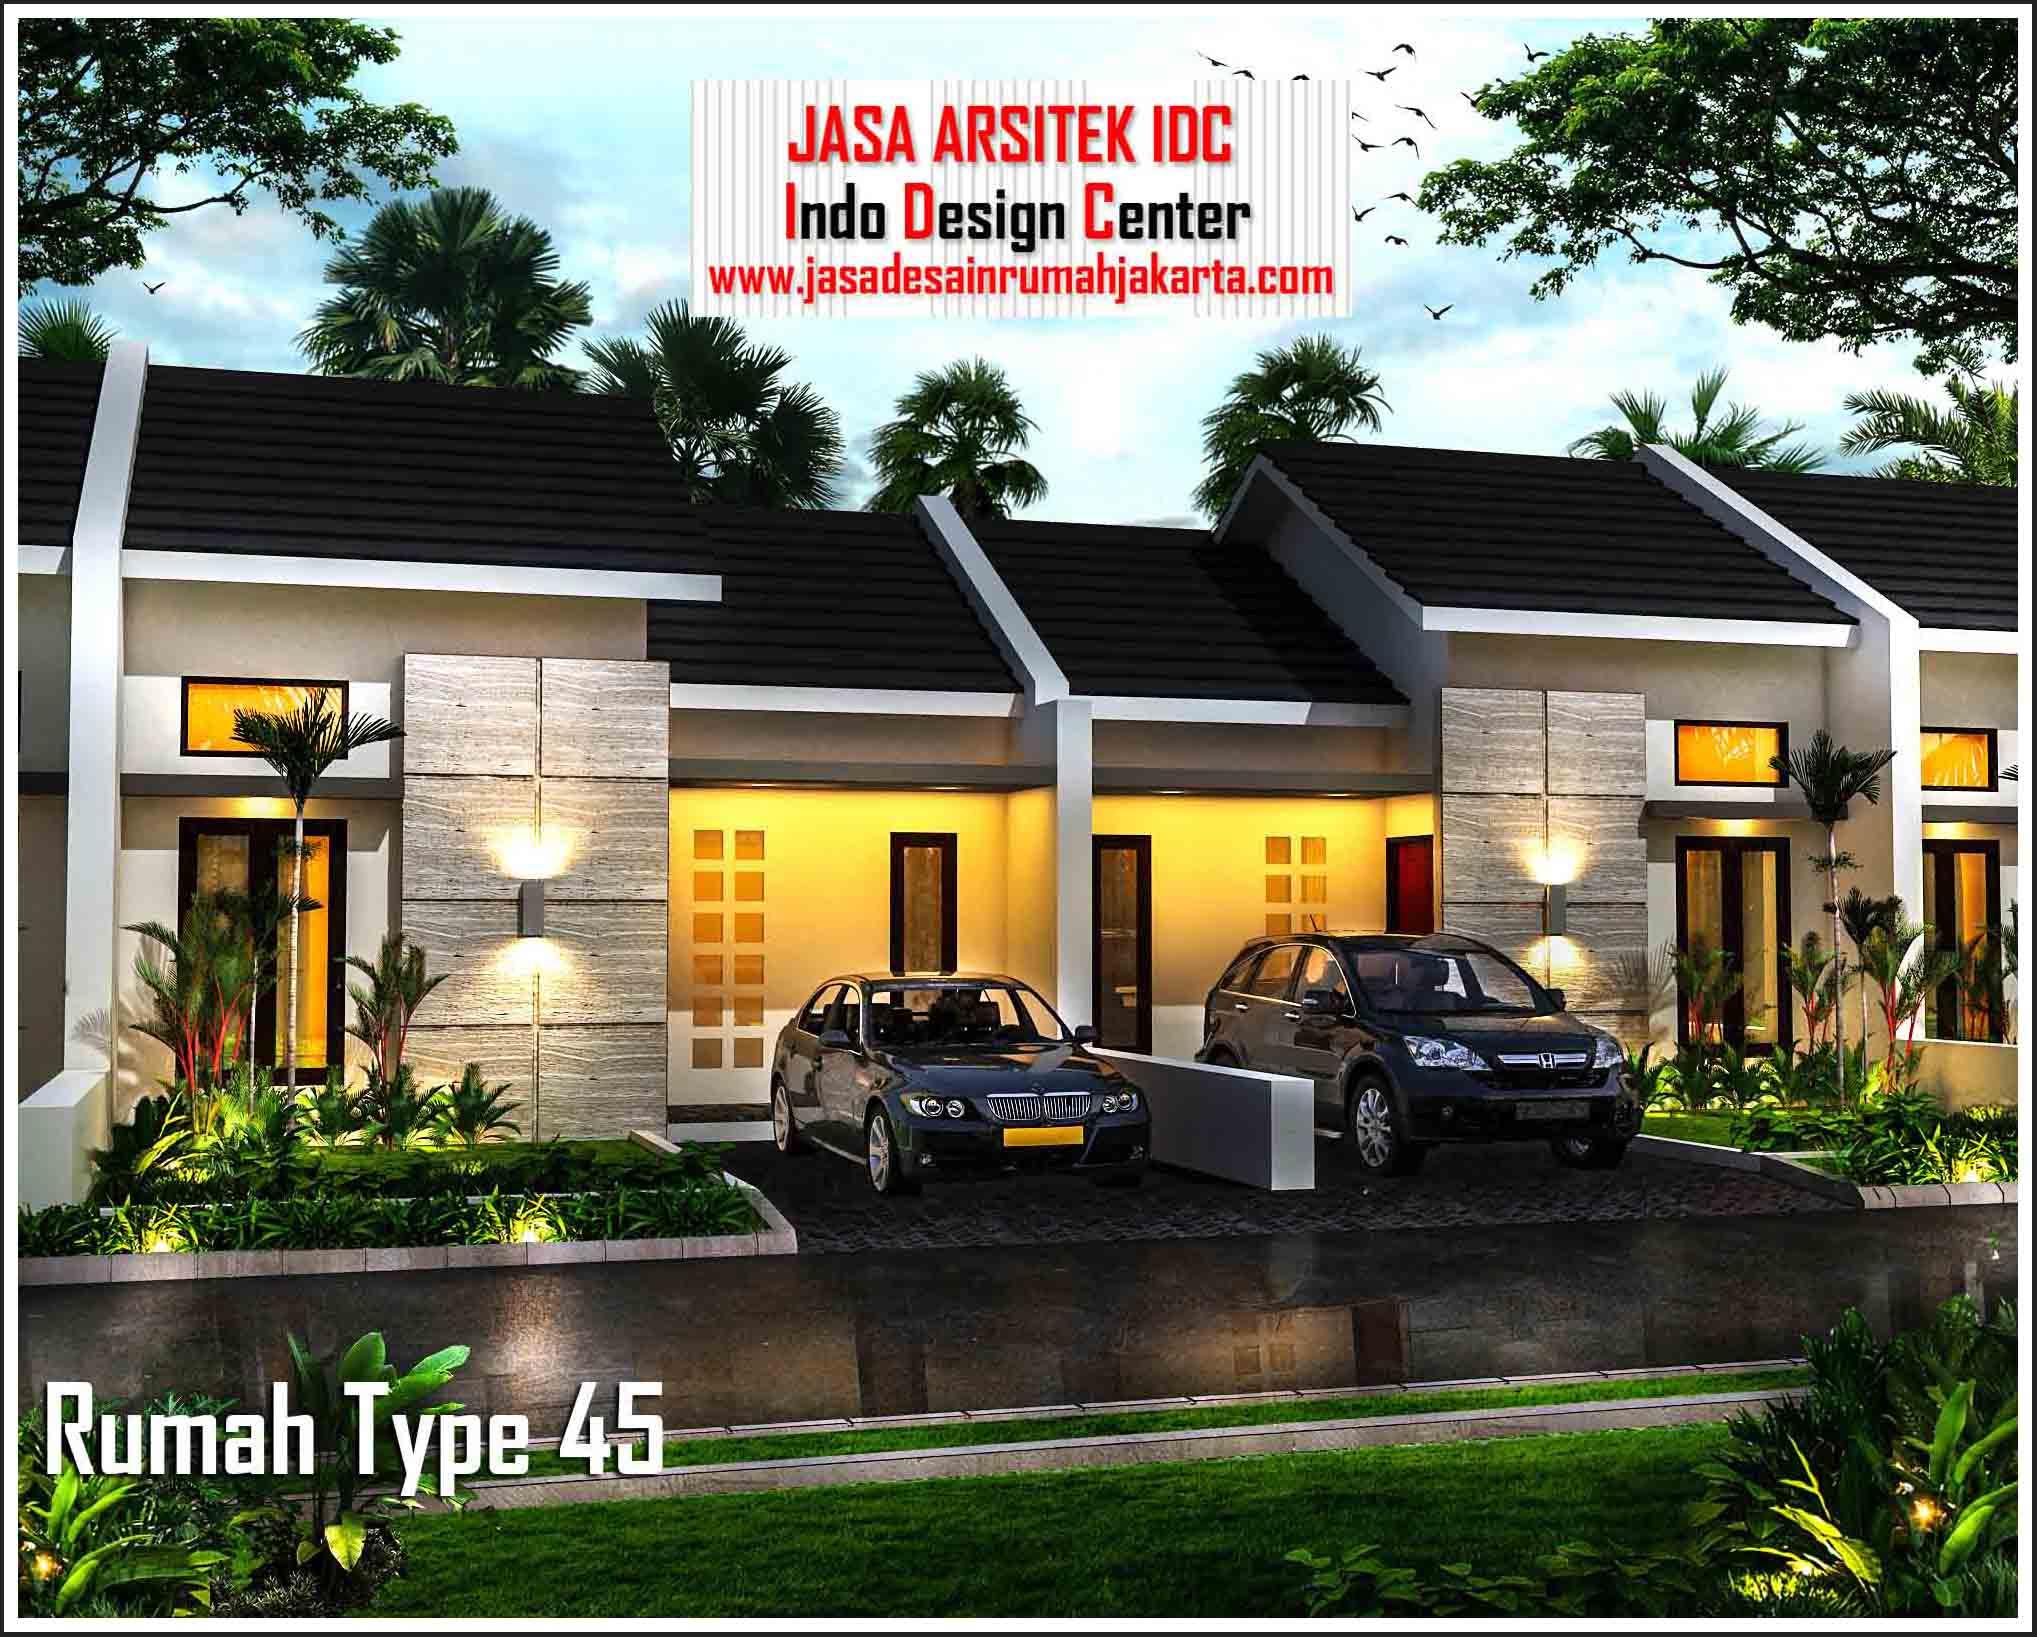 Desain Rumah Minimalis Modern 1 Lantai Type 45 Terbaru ...